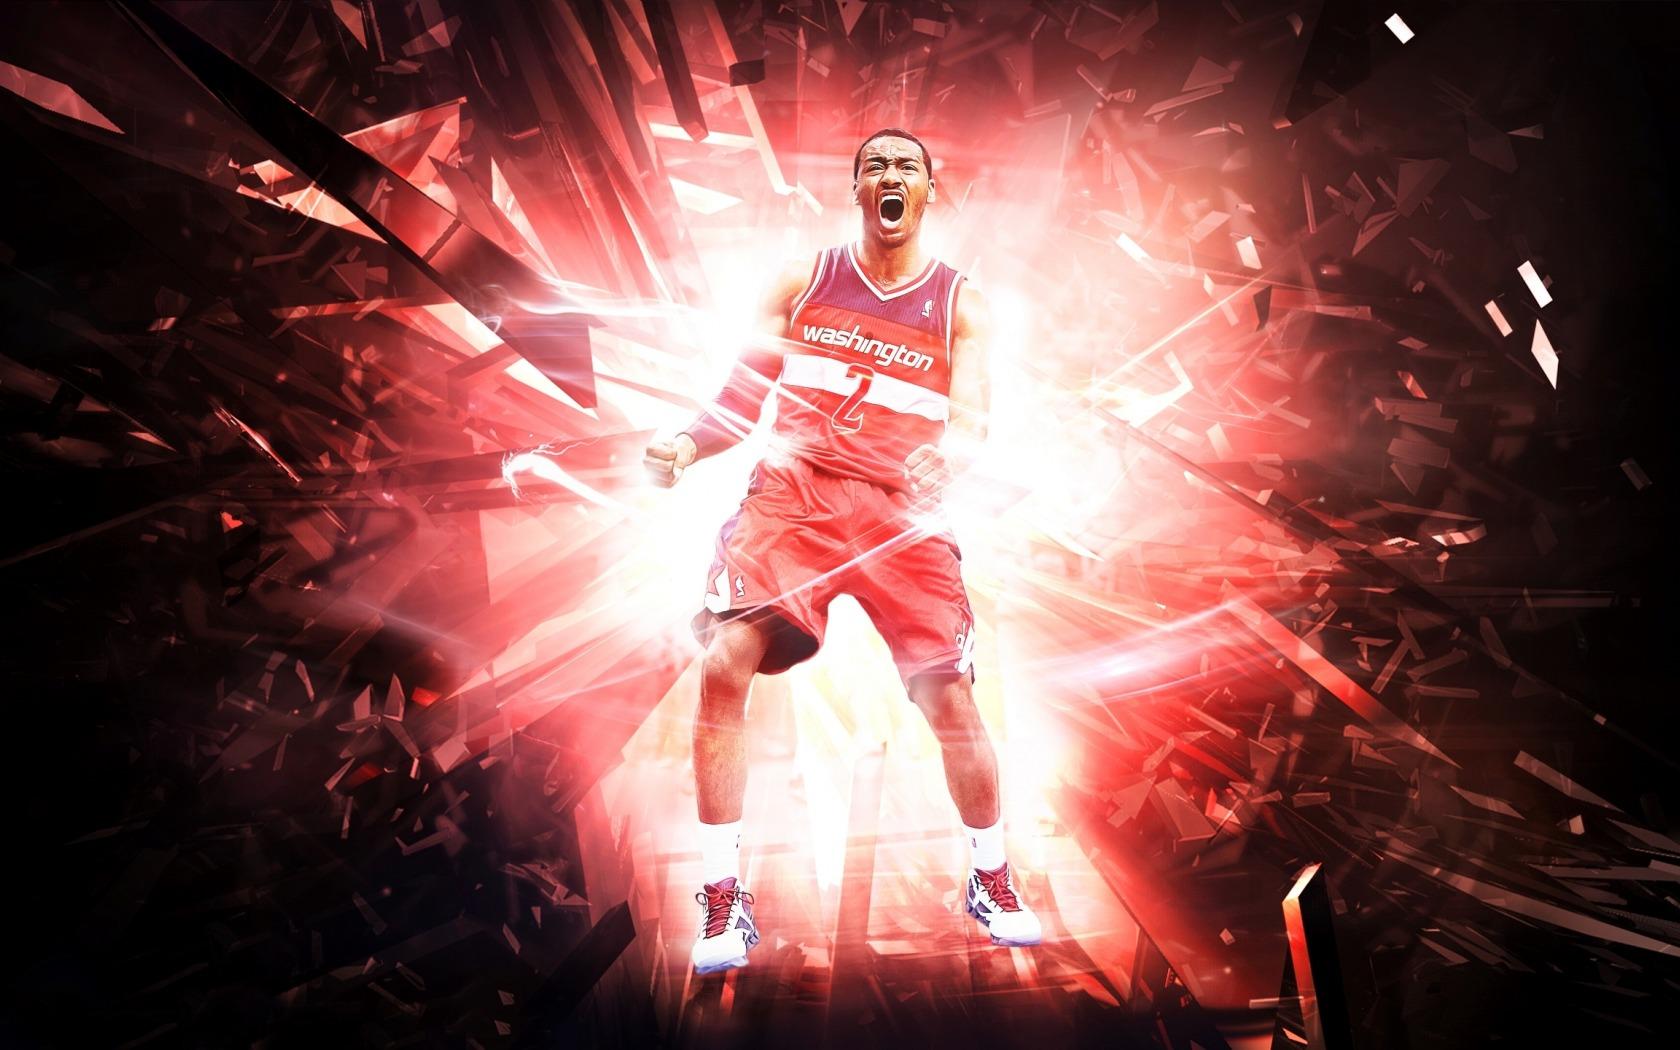 john wall basketball player in NBA sport abstract wallpaper 1680x1050